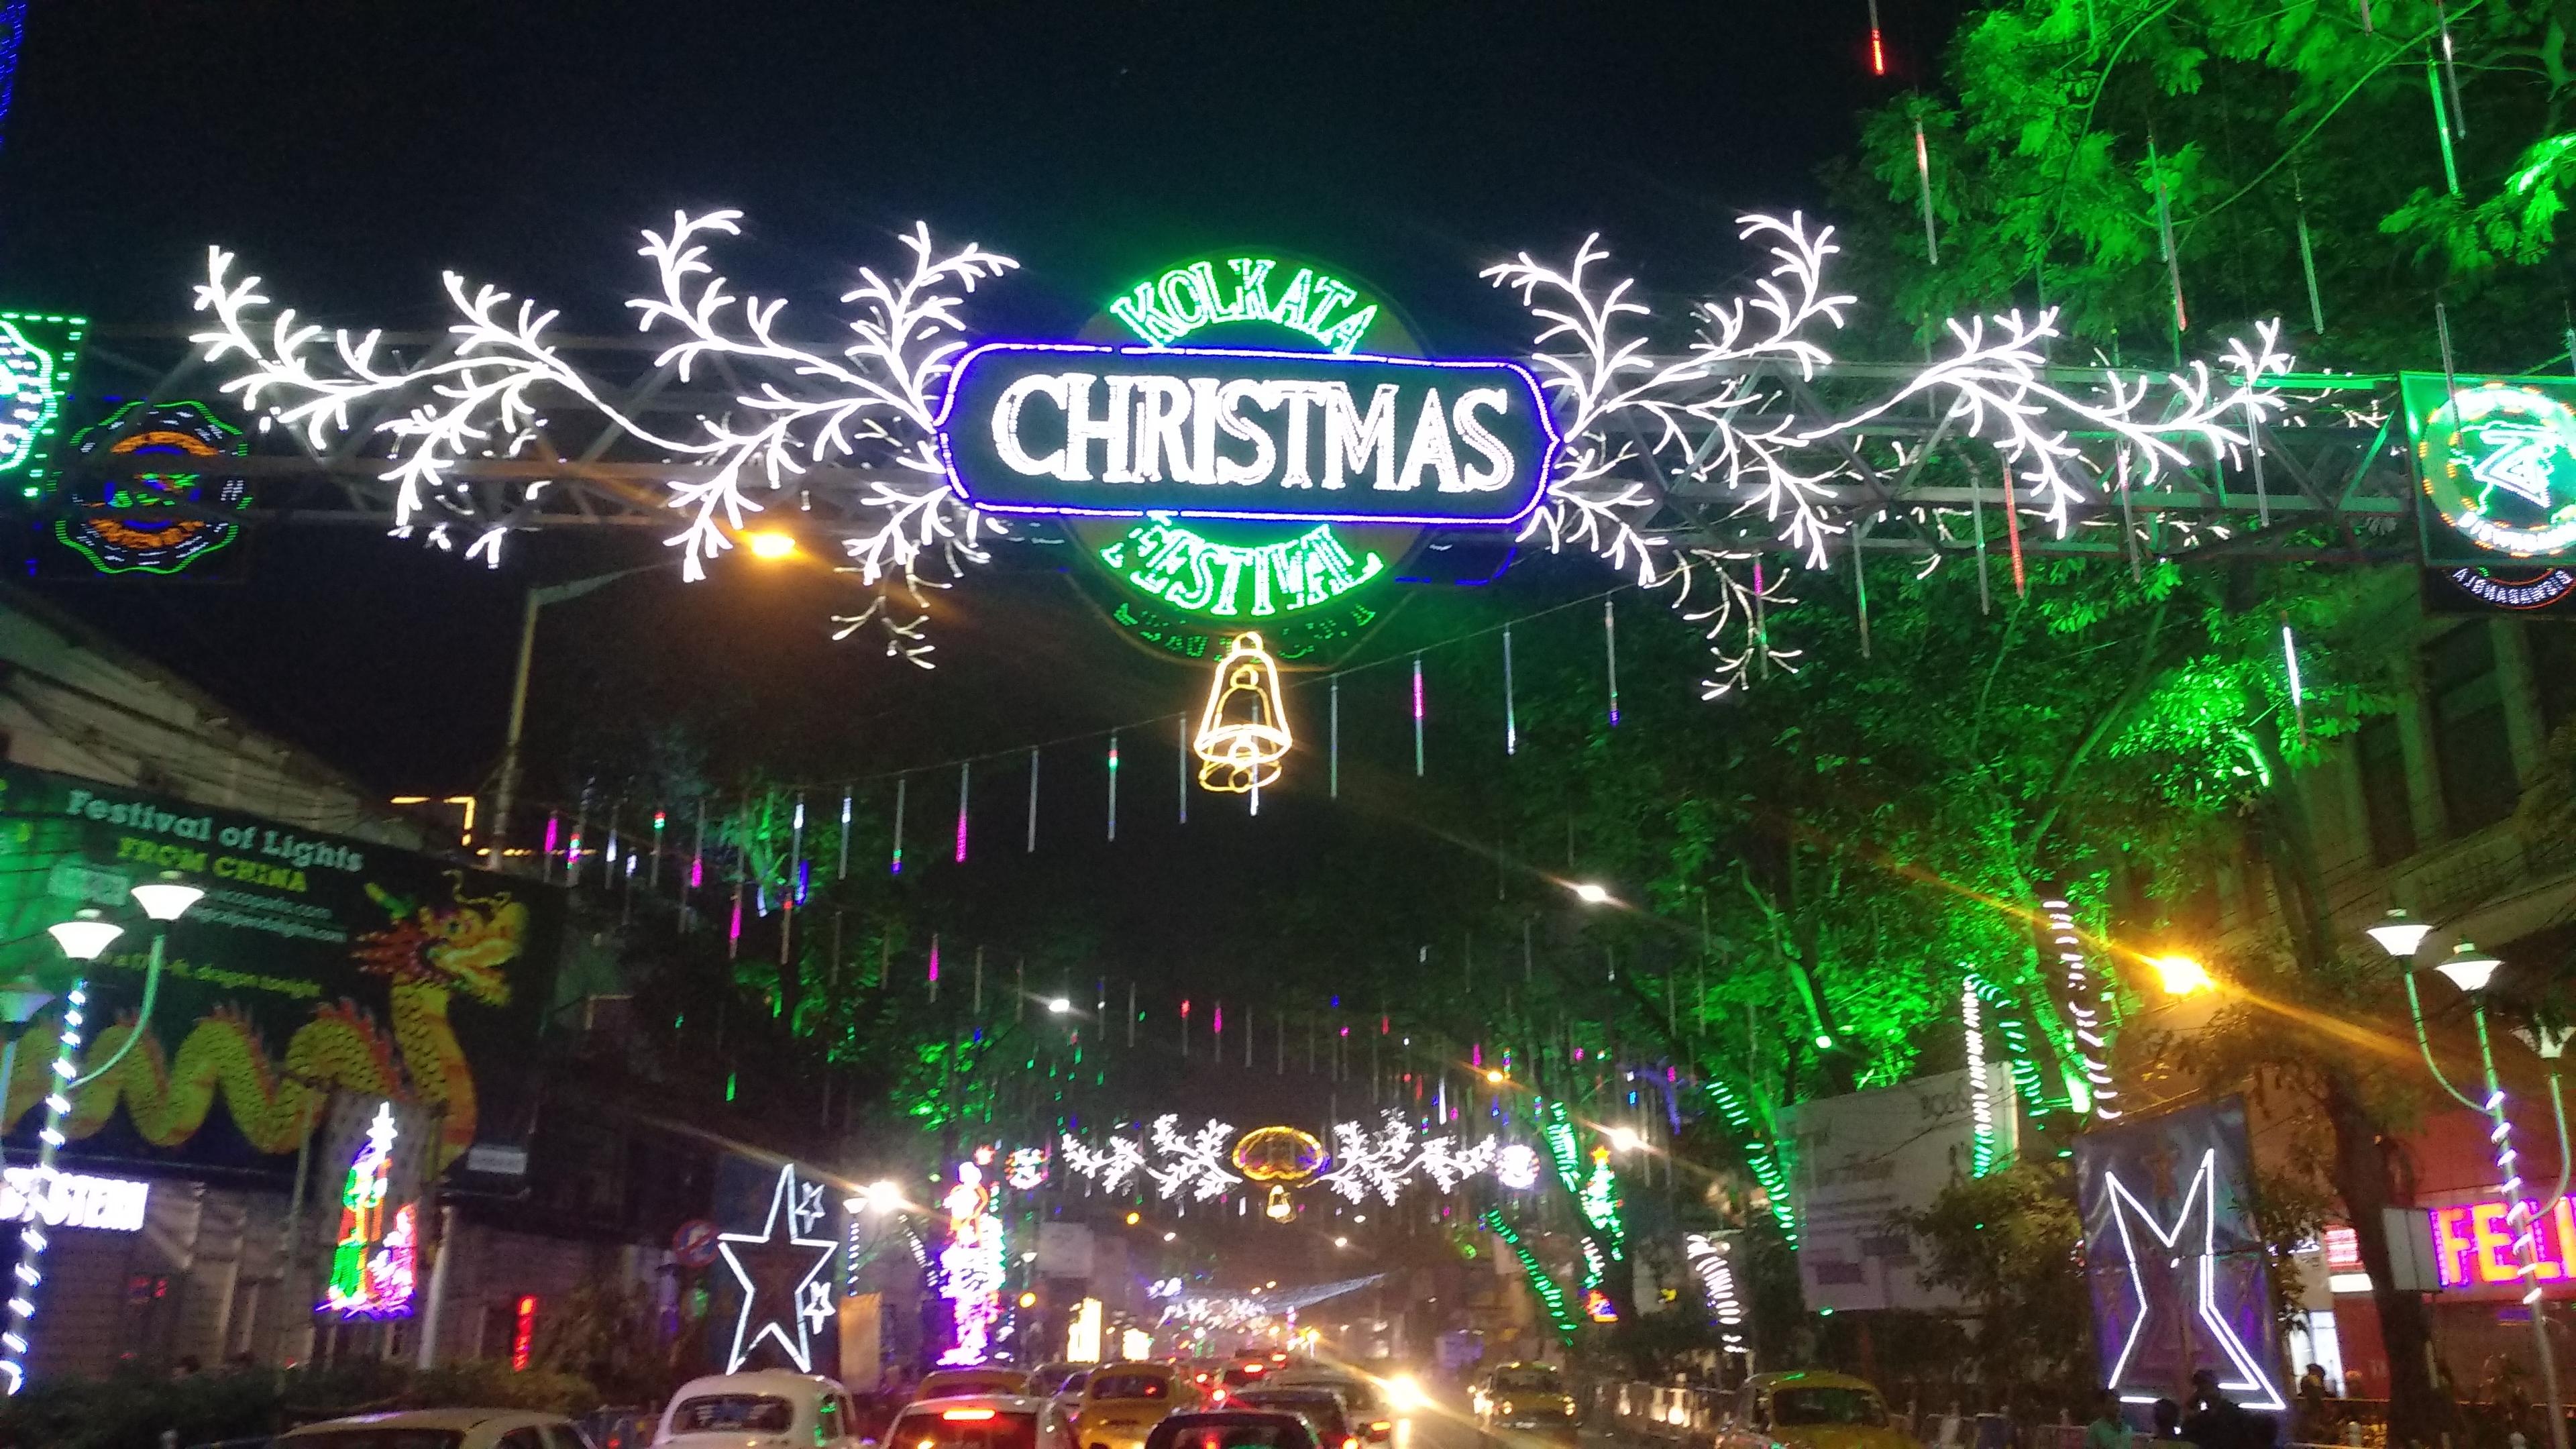 Park Street Kolkata During Christmas.File Parkstreet Christmas Kolkata Jpg Wikimedia Commons